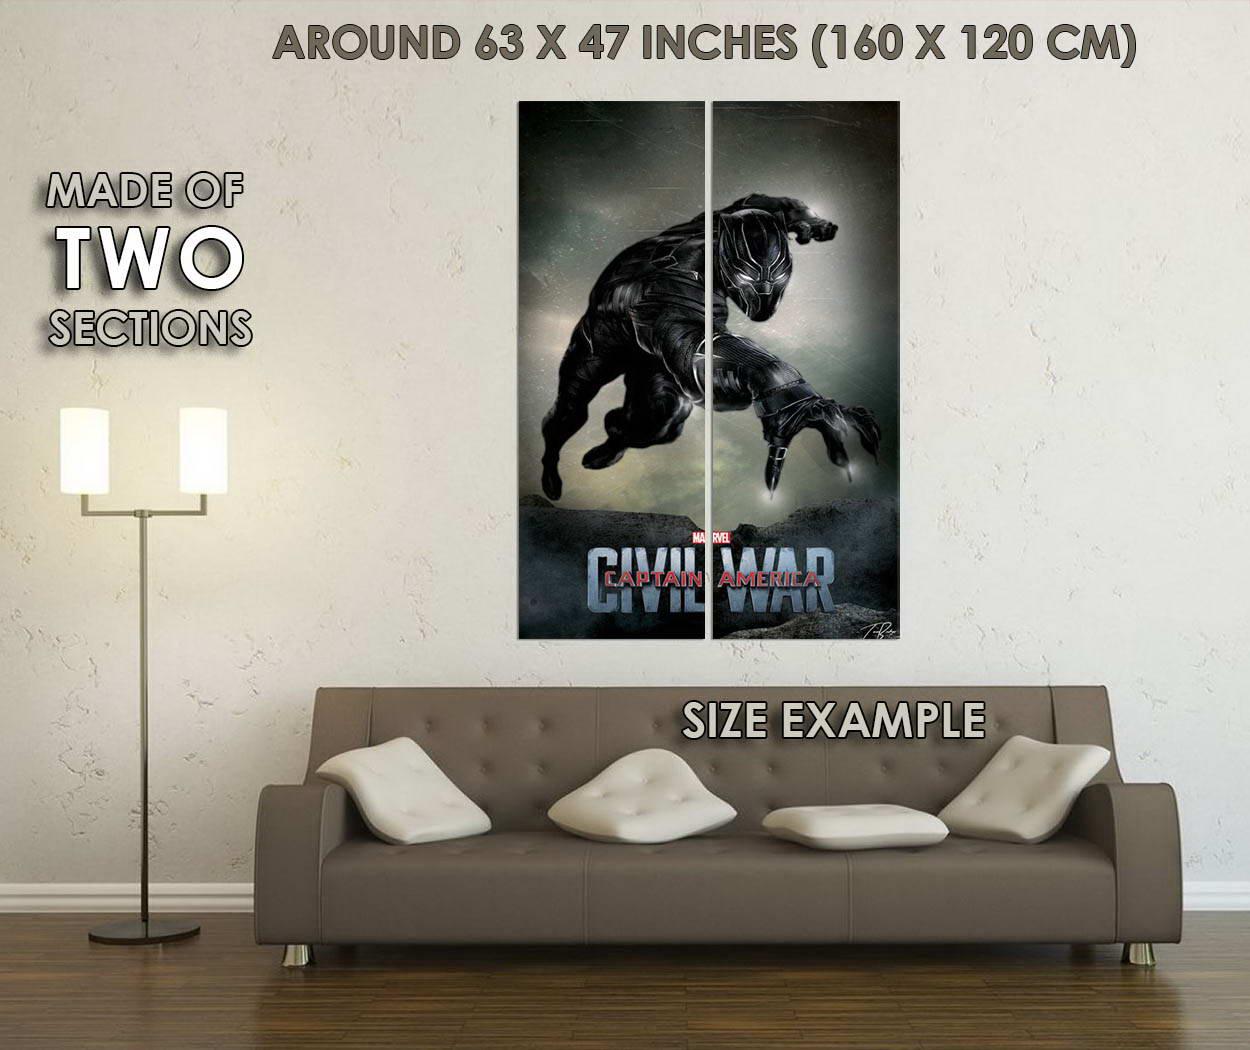 10804-Black-Panther-Captain-America-Civil-War-Superhero-Movie-GLOSSY-POSTER-CA thumbnail 6